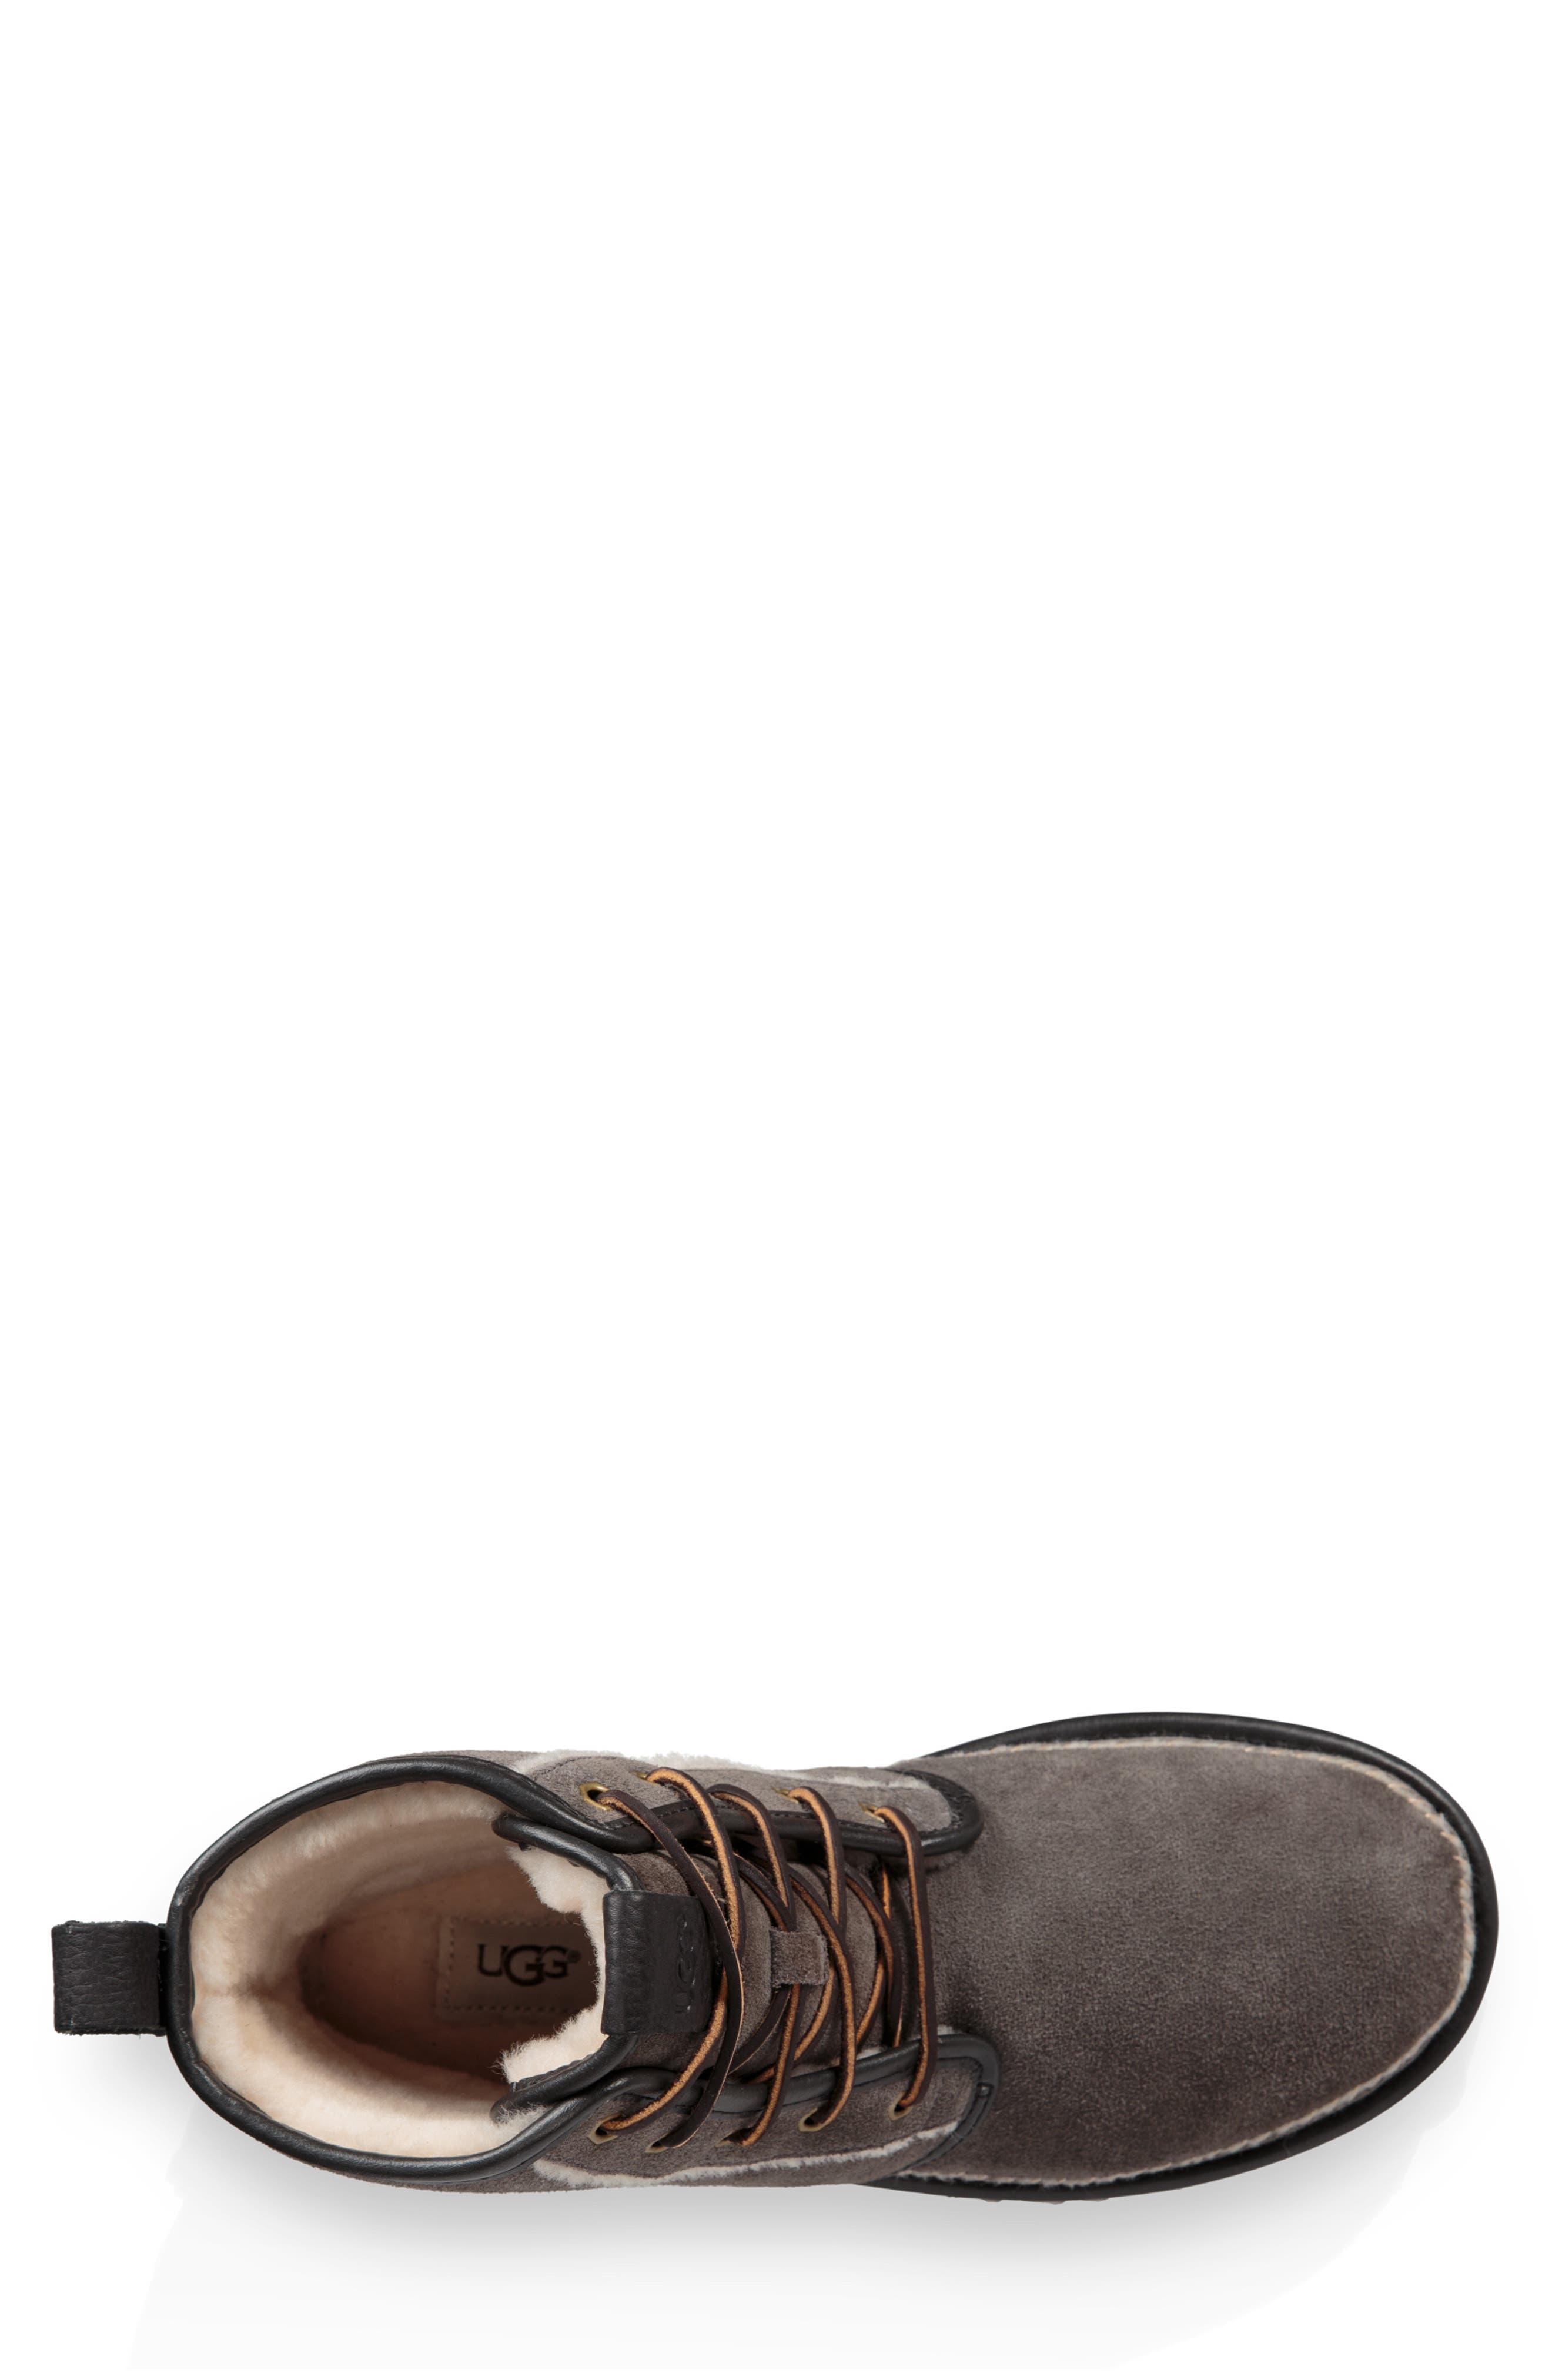 Harkley Stitch Plain Toe Boot,                             Alternate thumbnail 4, color,                             DARK GREY